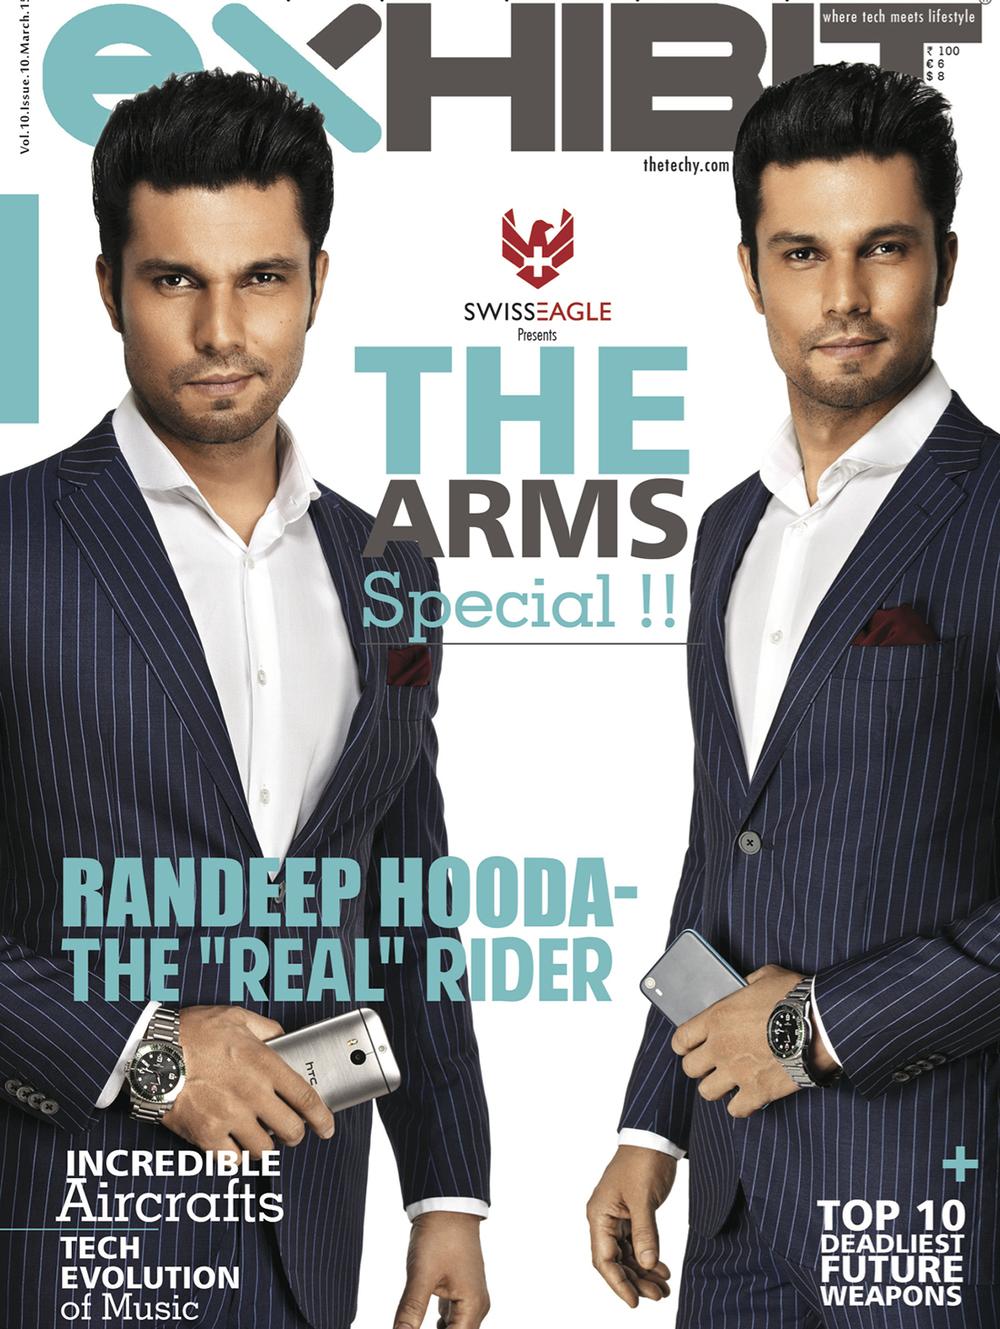 randeep hooda march issue high resolution(2)cover.jpg